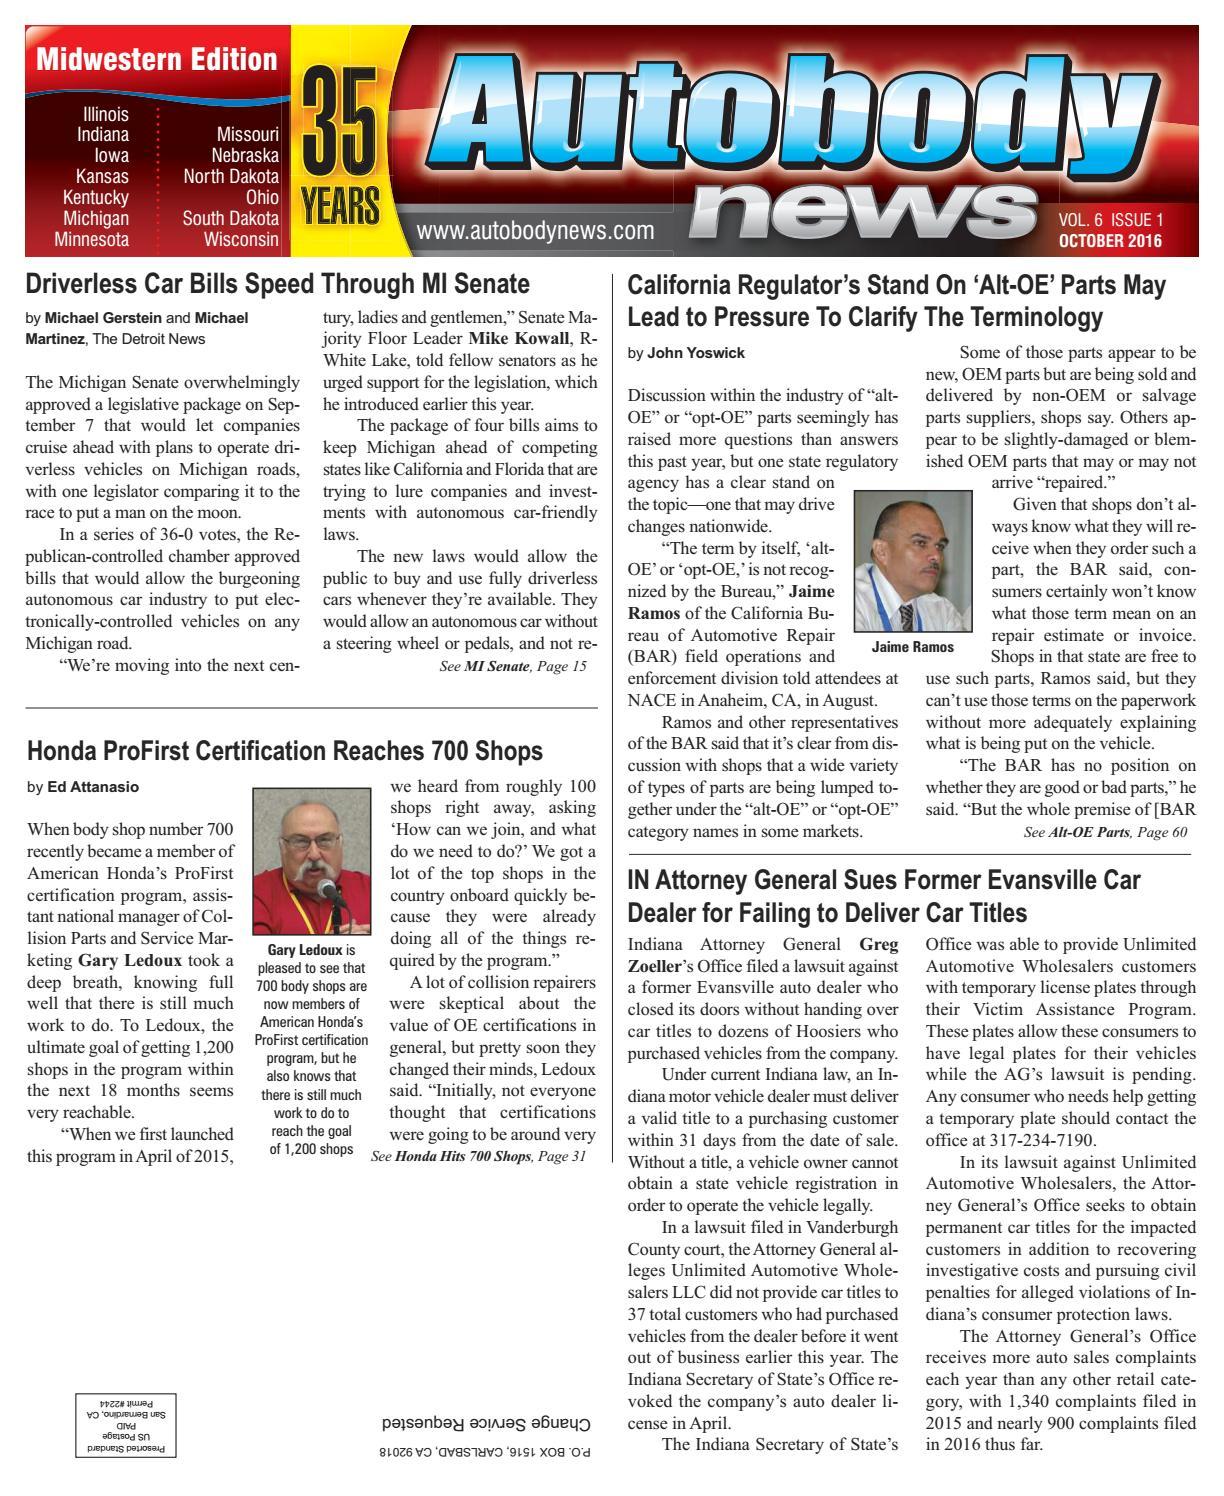 Midwestern October 2016 Issue By Autobody News Issuu Custom Paint Job 2002 Daged Akota